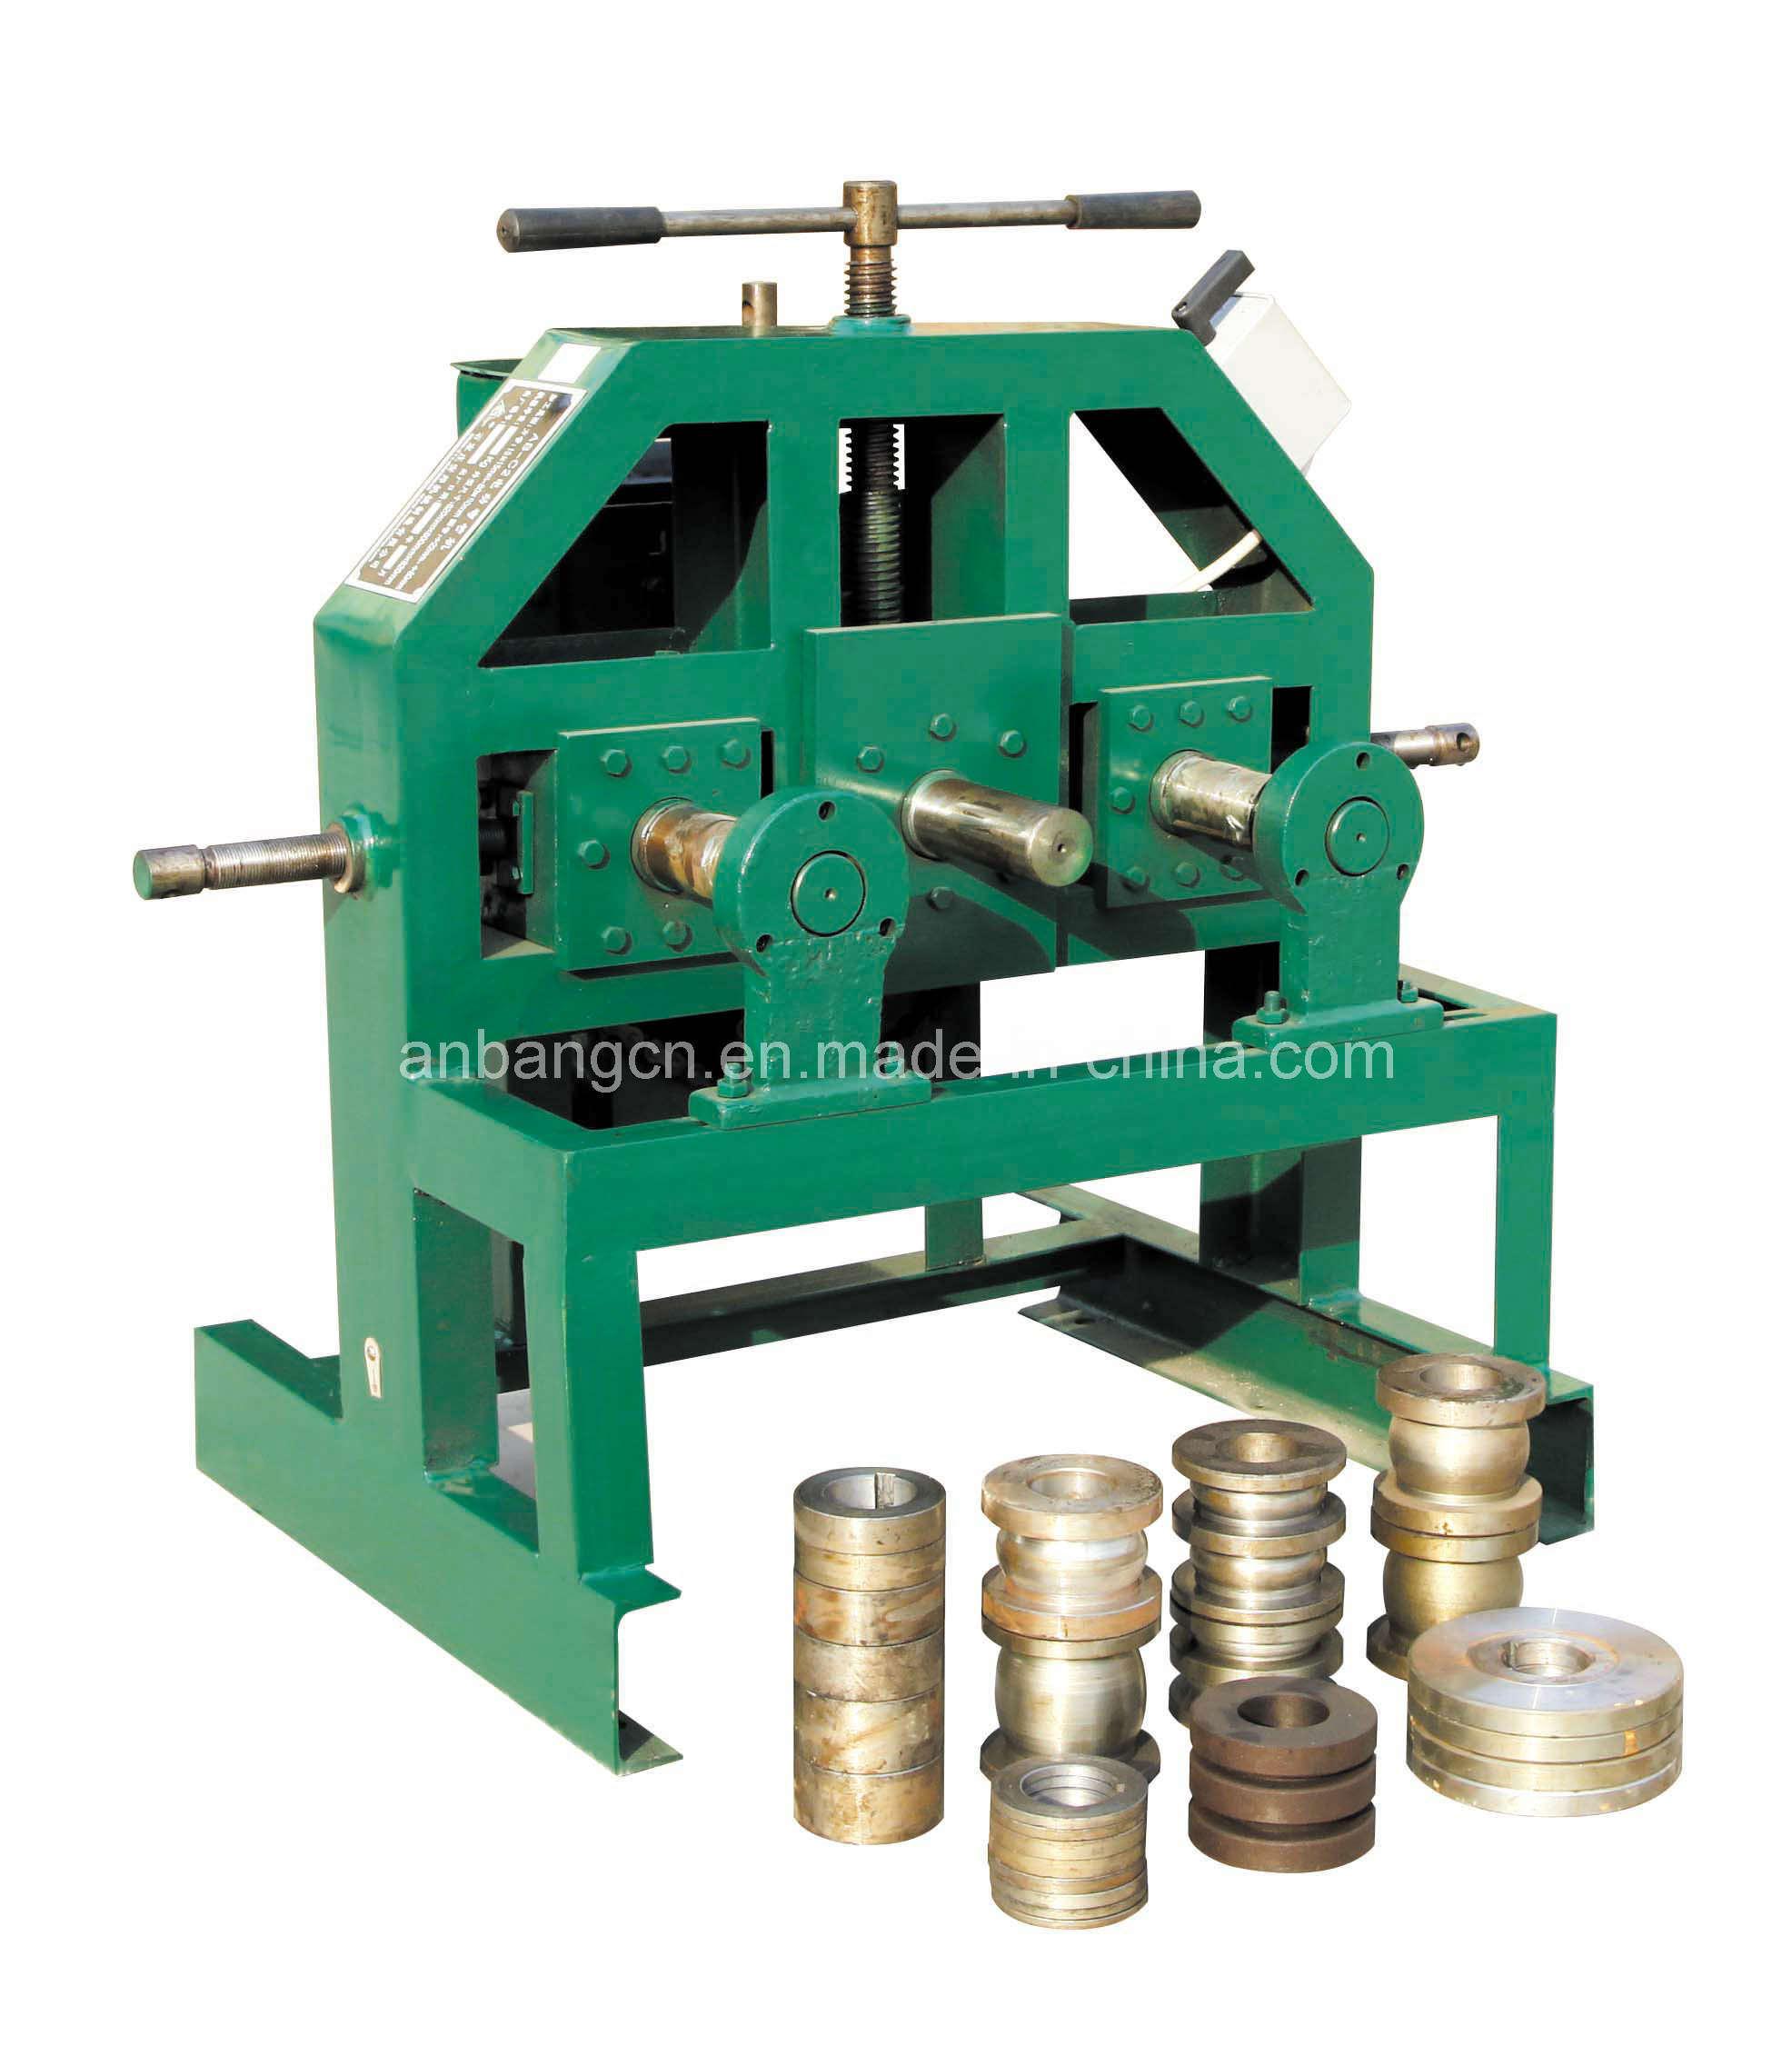 hight resolution of china the pipe bending machine ab c2 china wrought iron machine pipe bender